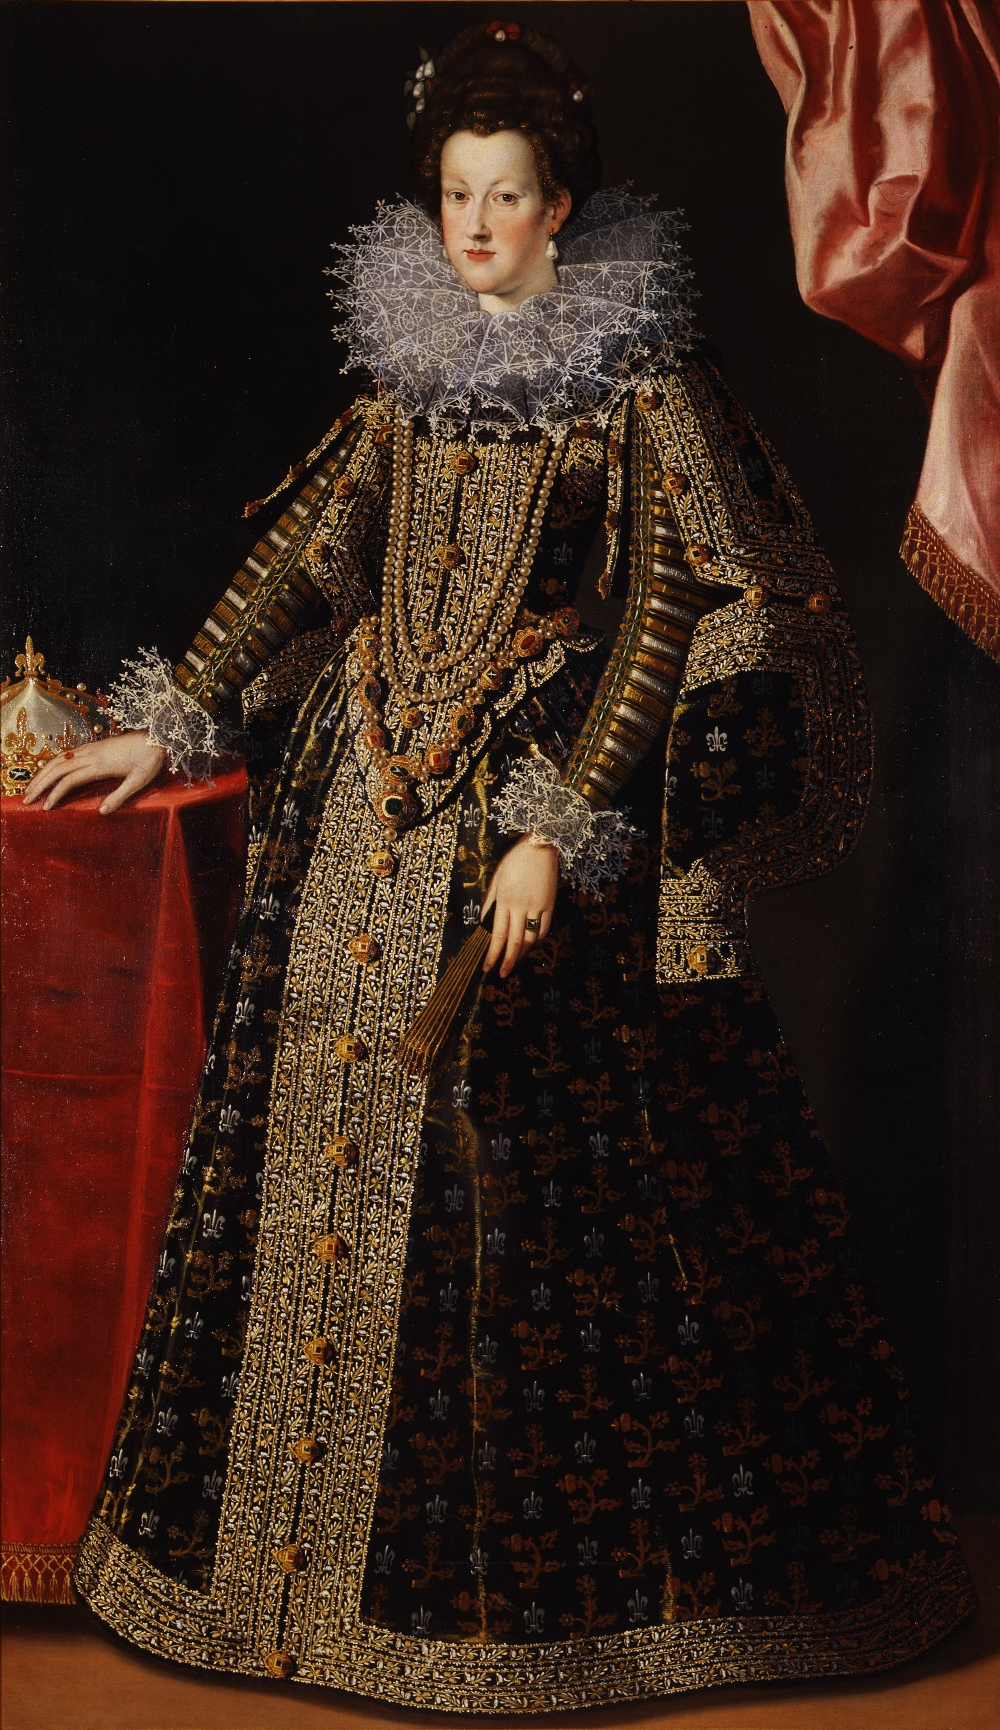 Maria de%27 Medici%2C Queen of France in circa 1600 by an unkown artist 17th Century Fashion